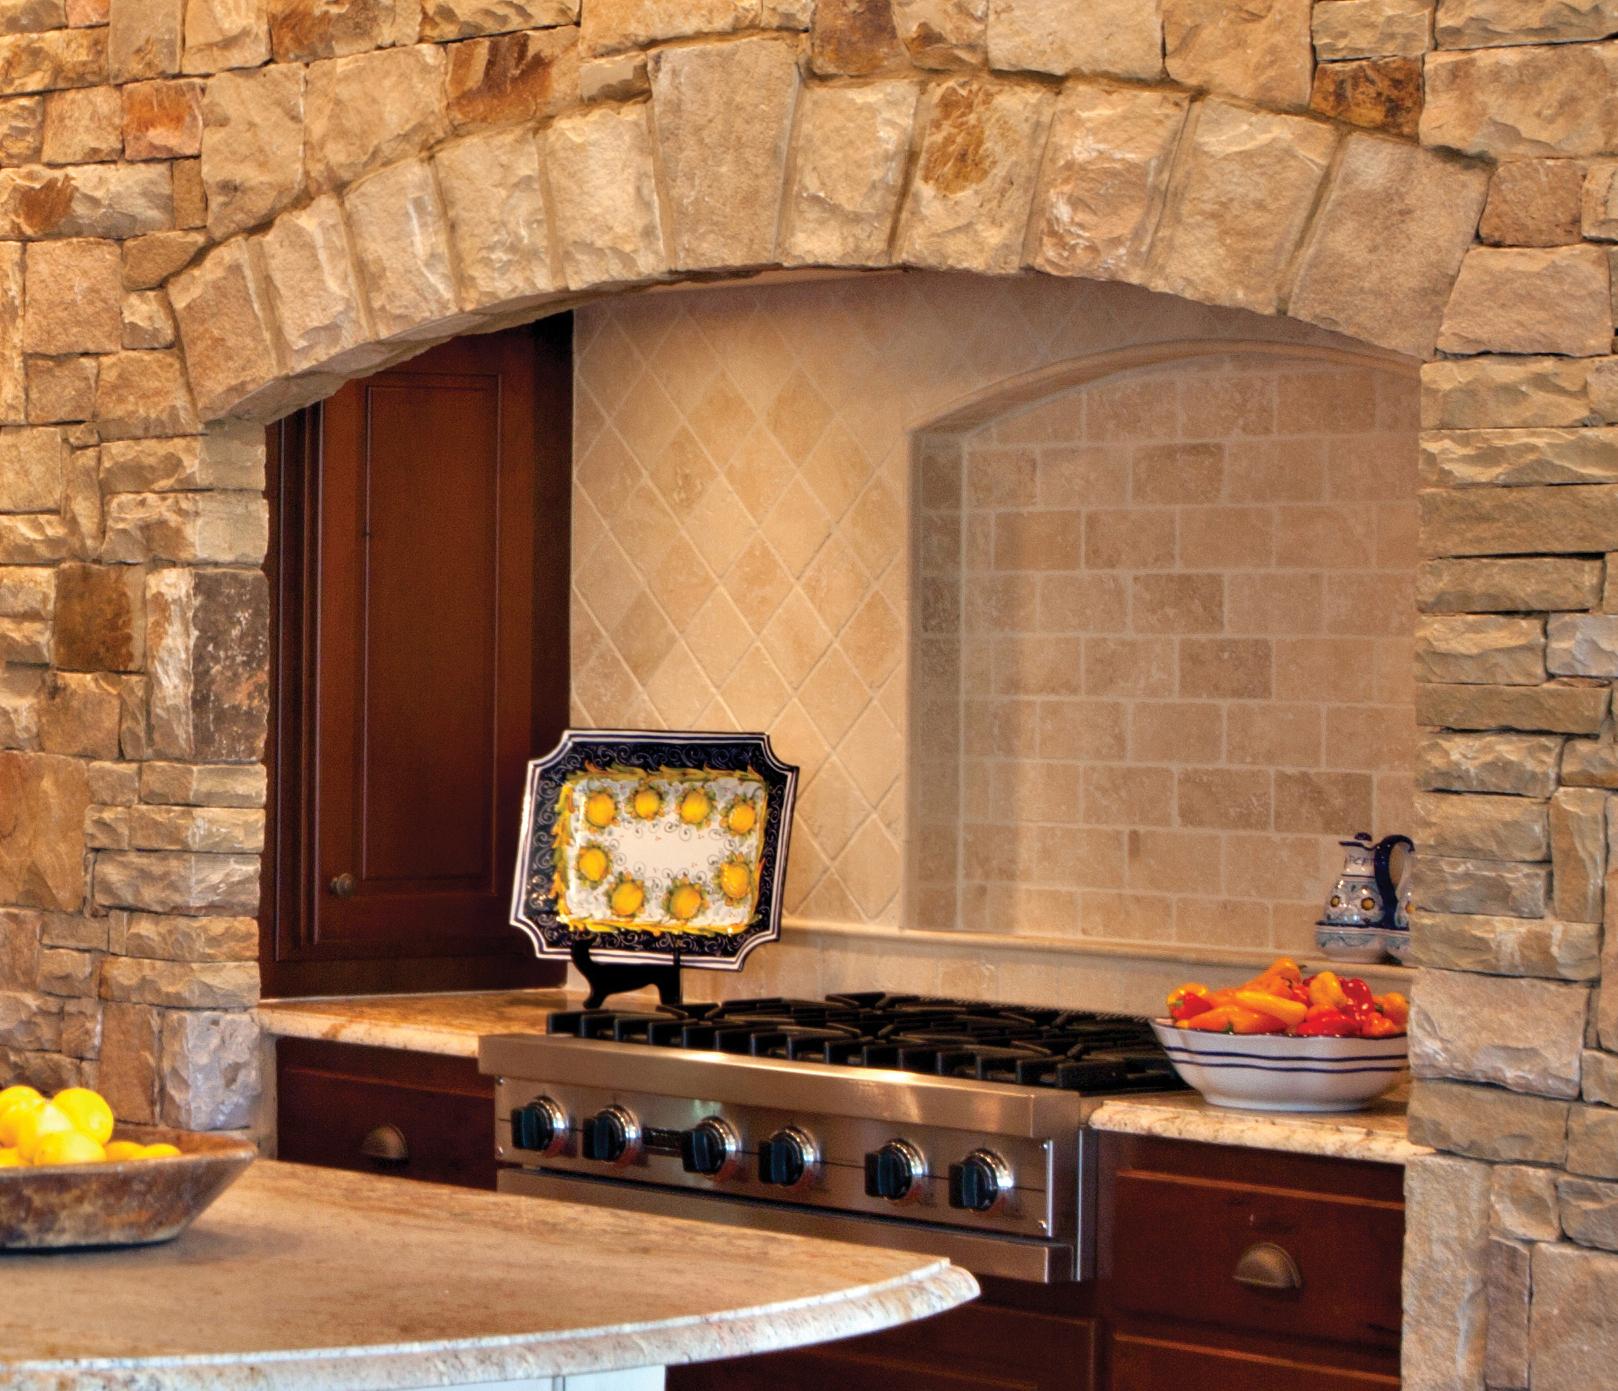 rustic stone alcove kitchen backsplash by Elizabeth Swartz Interiors